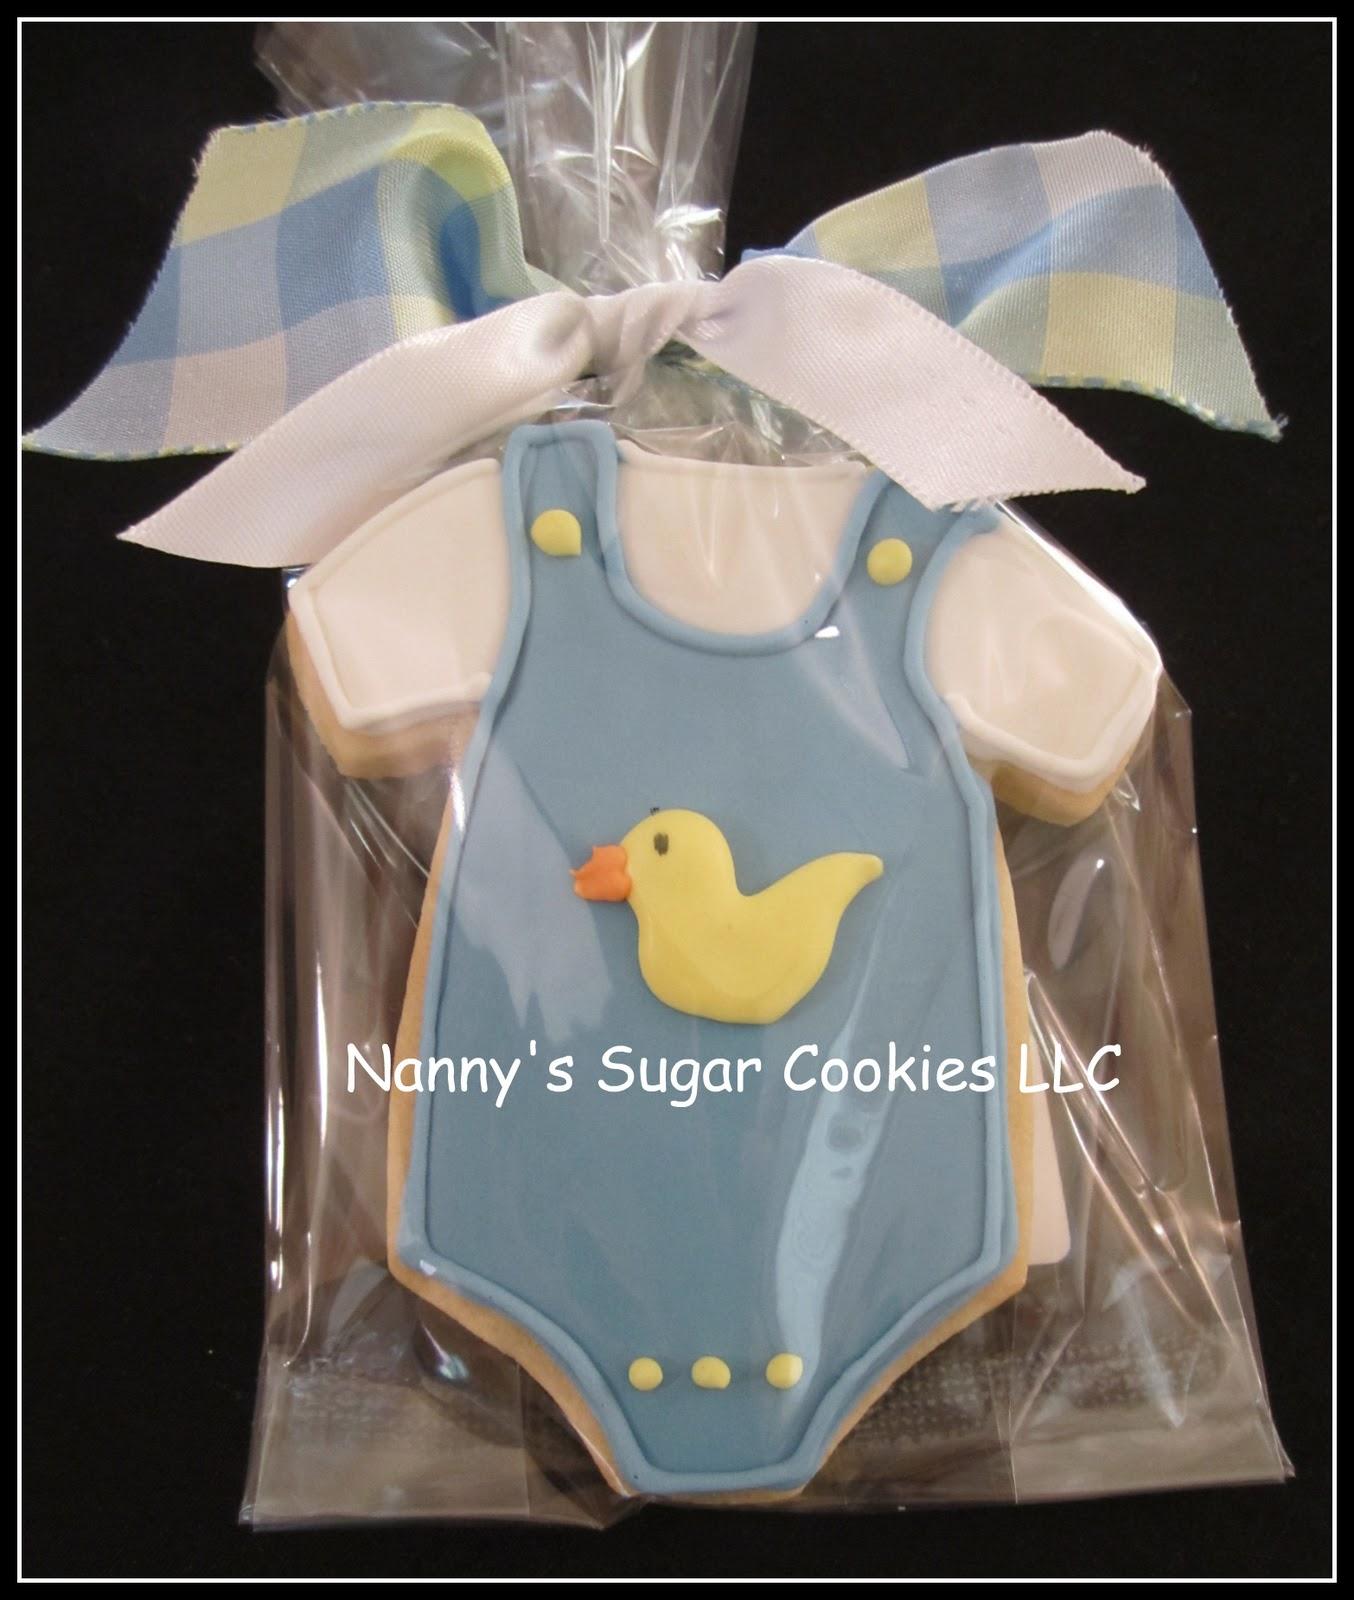 nanny 39 s sugar cookies llc november 2011